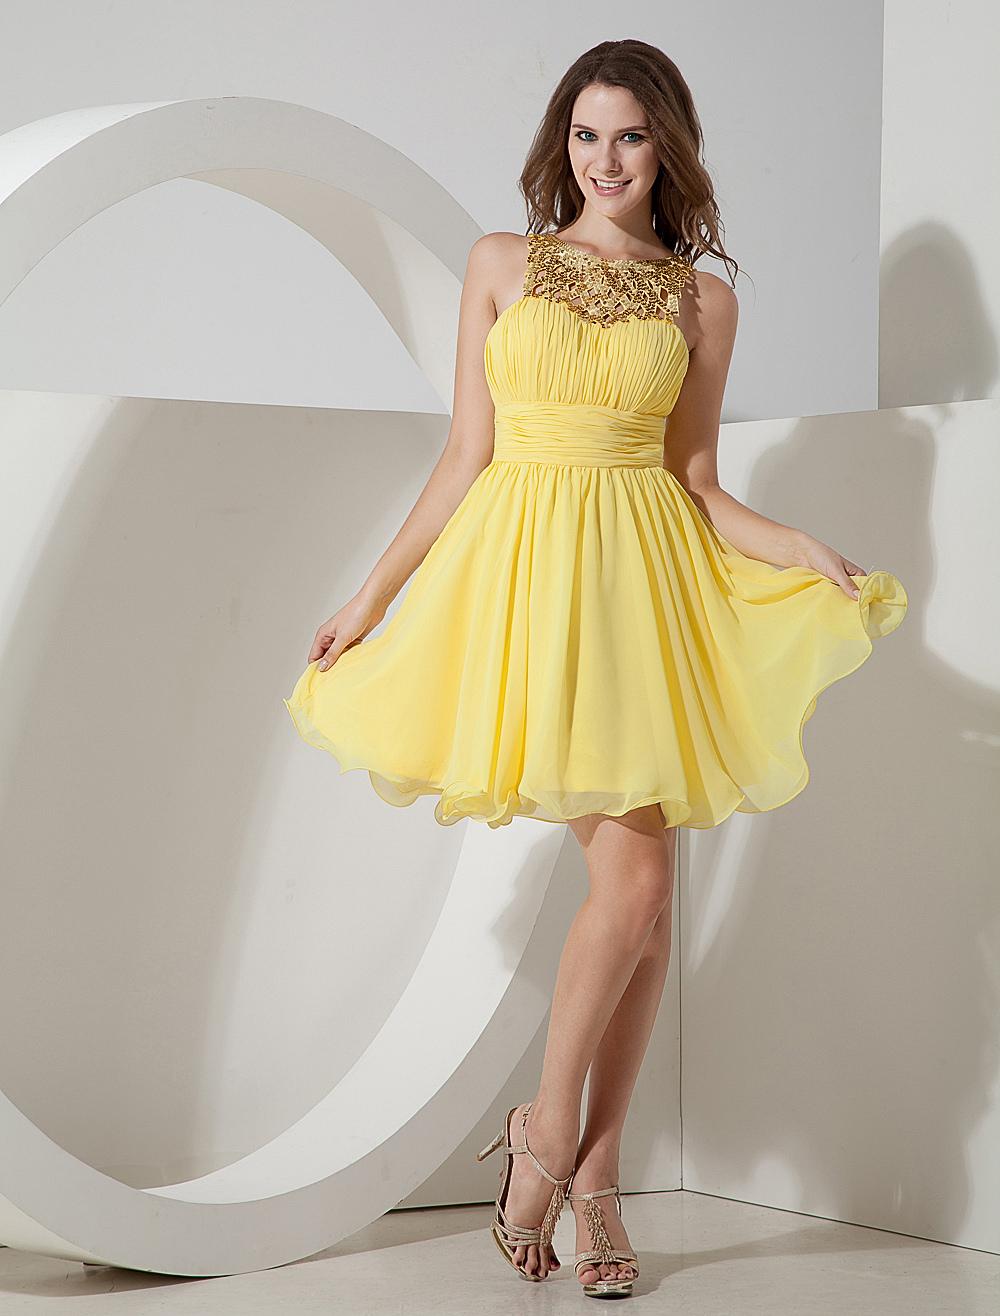 Daffodil Chiffon Sequin Sleeveless Homecoming Dress